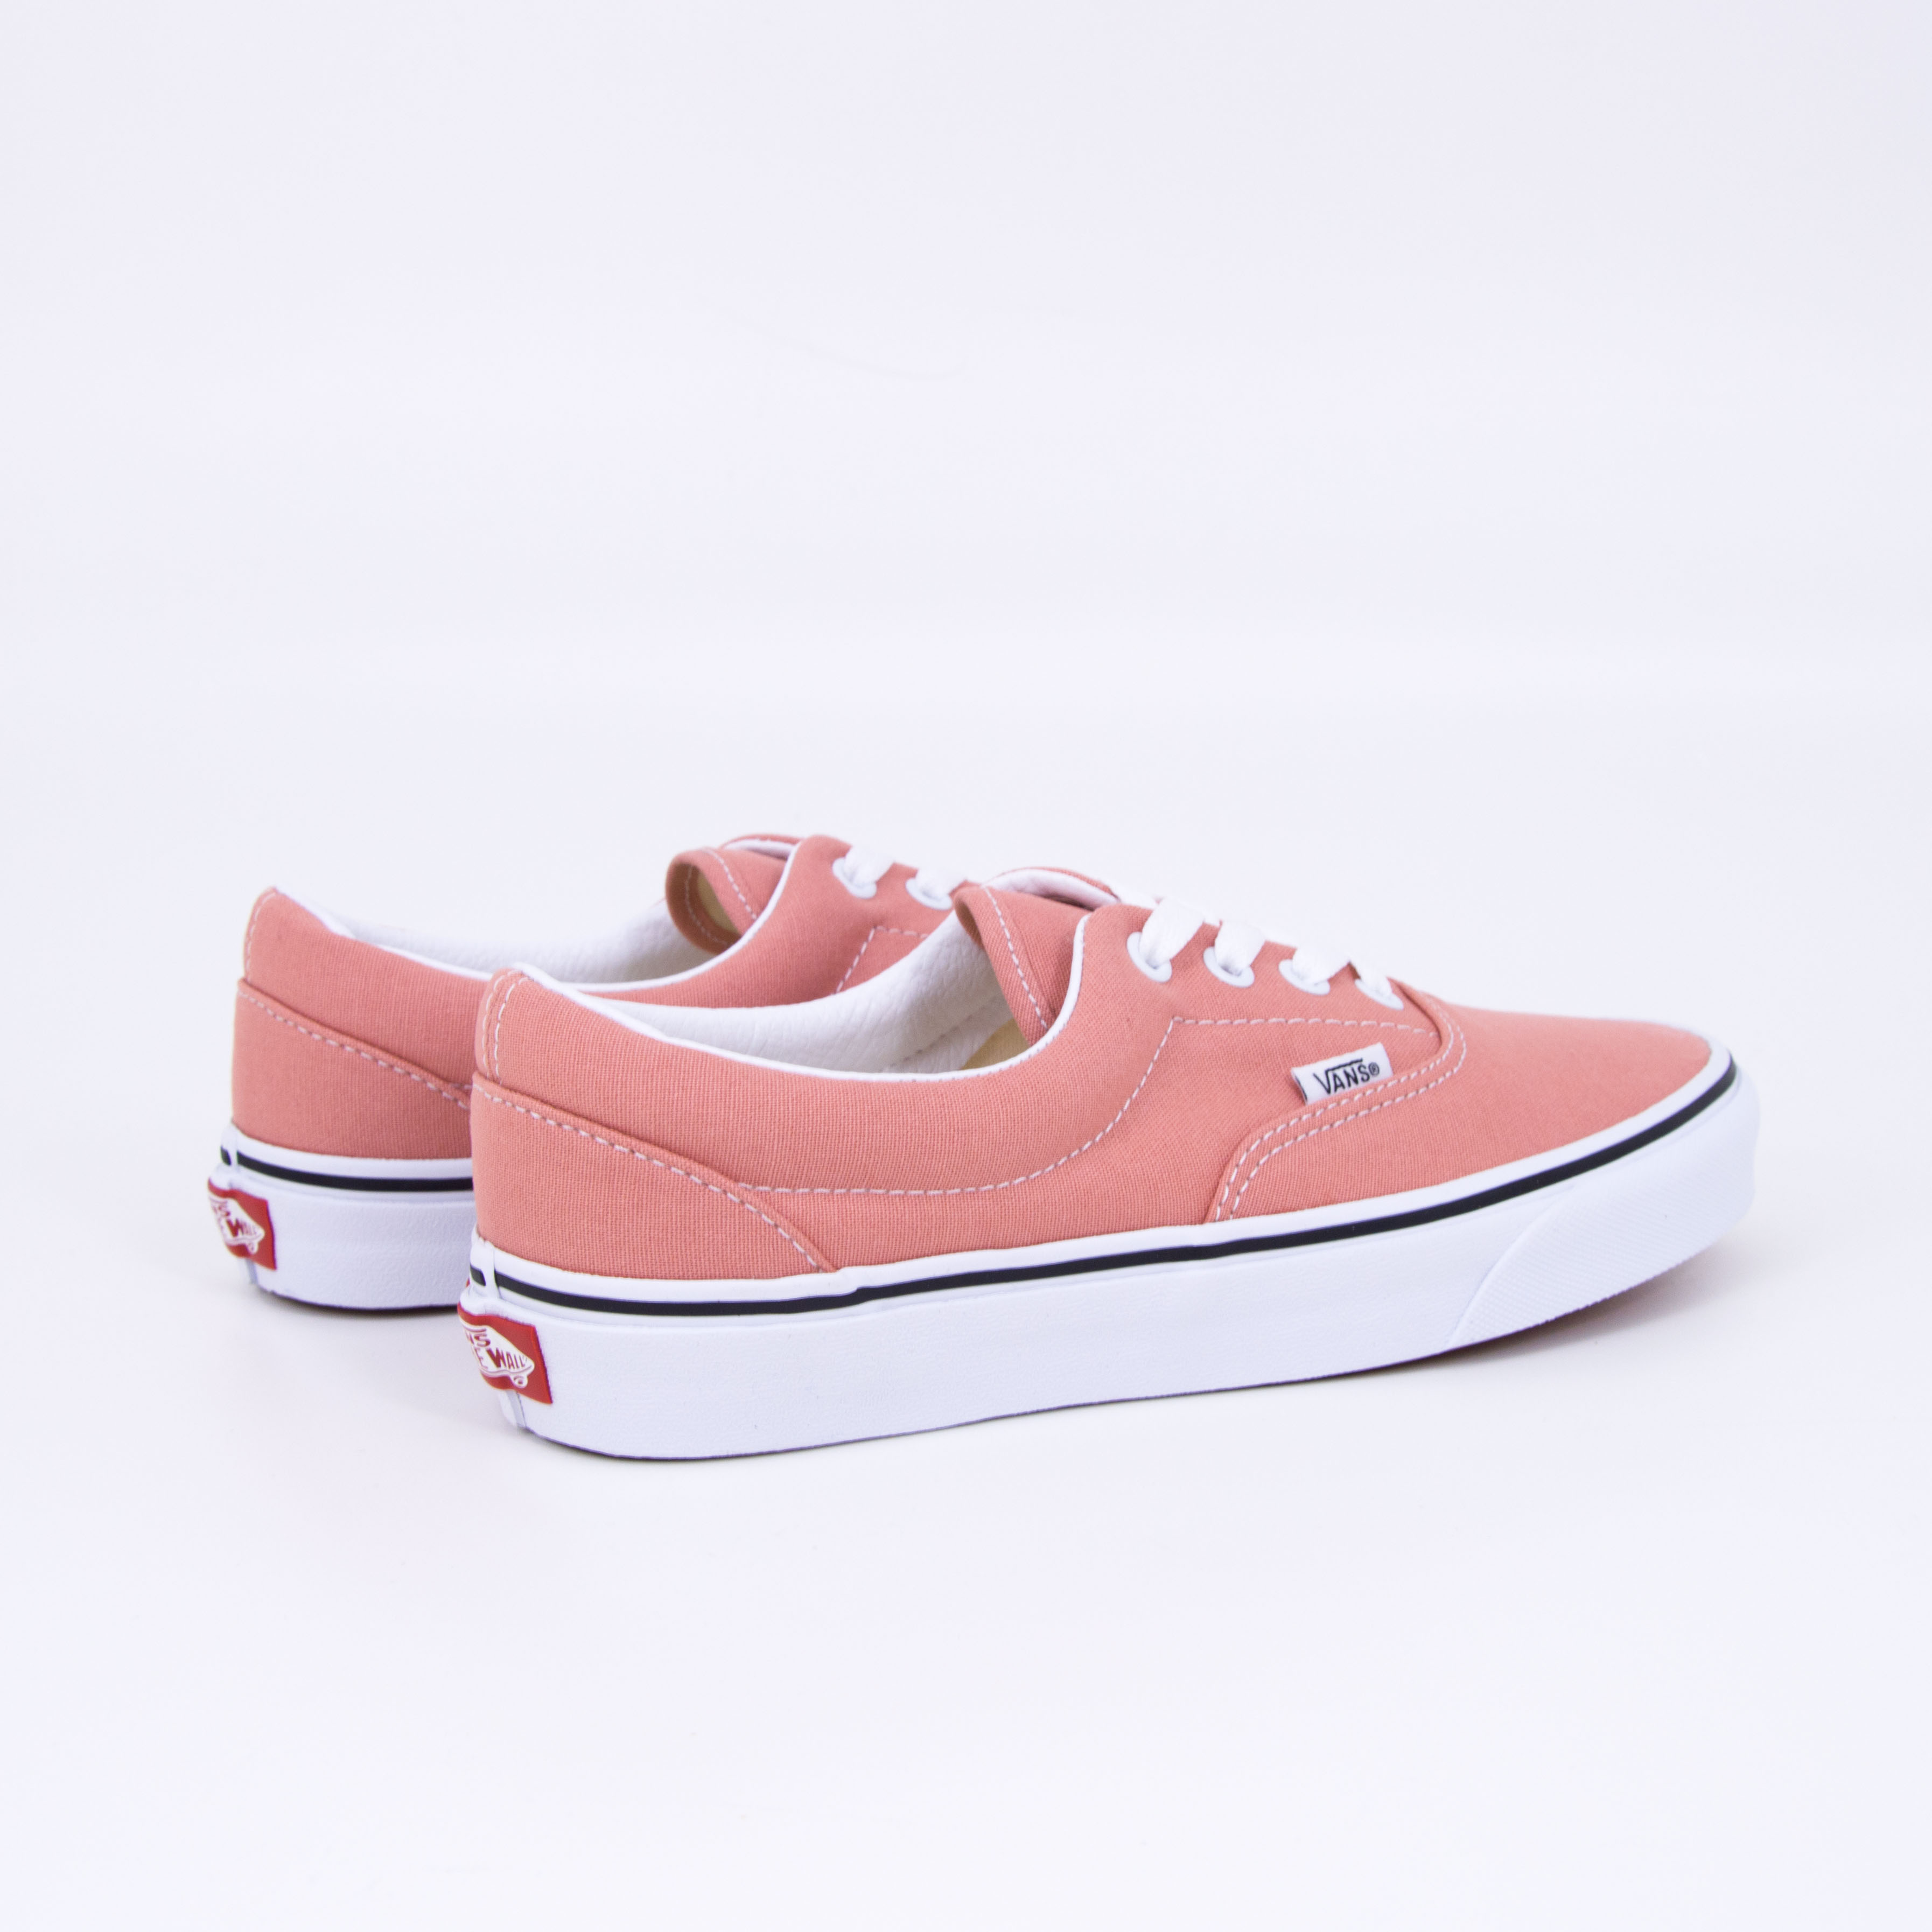 Vans - ERA - Rose Dawn/True White